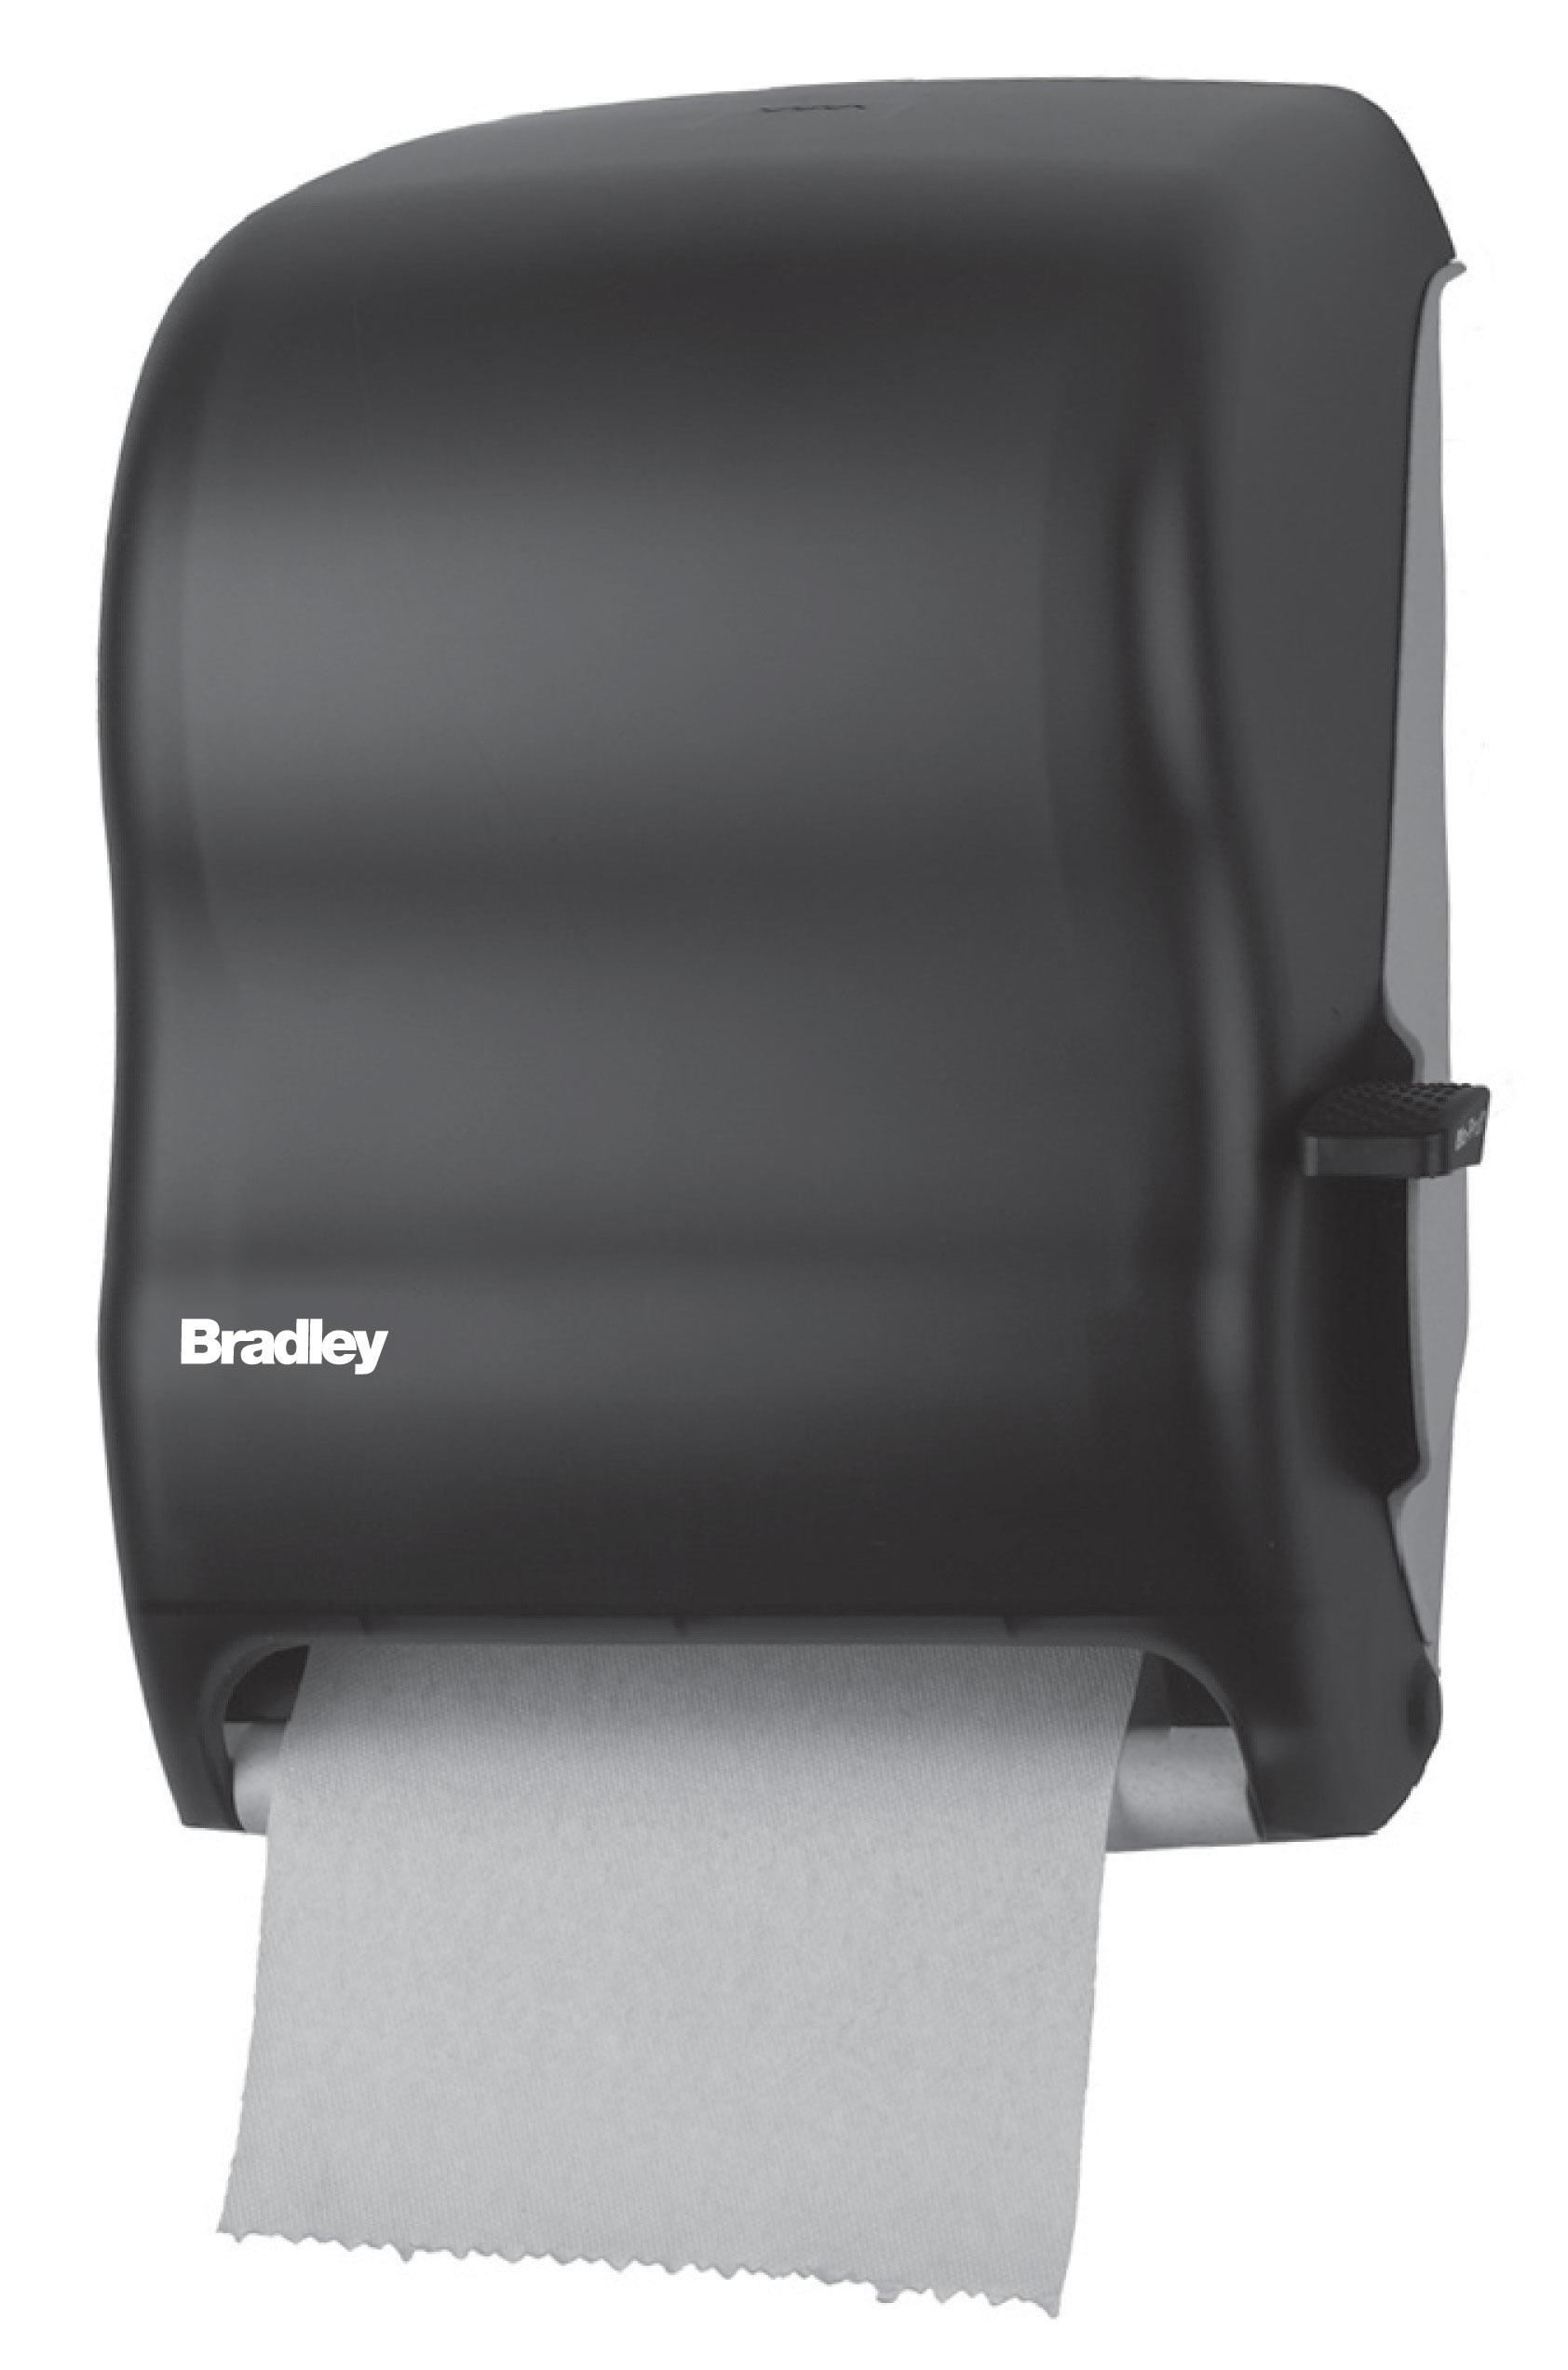 lever operated roll towel dispenser - Bradley Bathroom Accessories